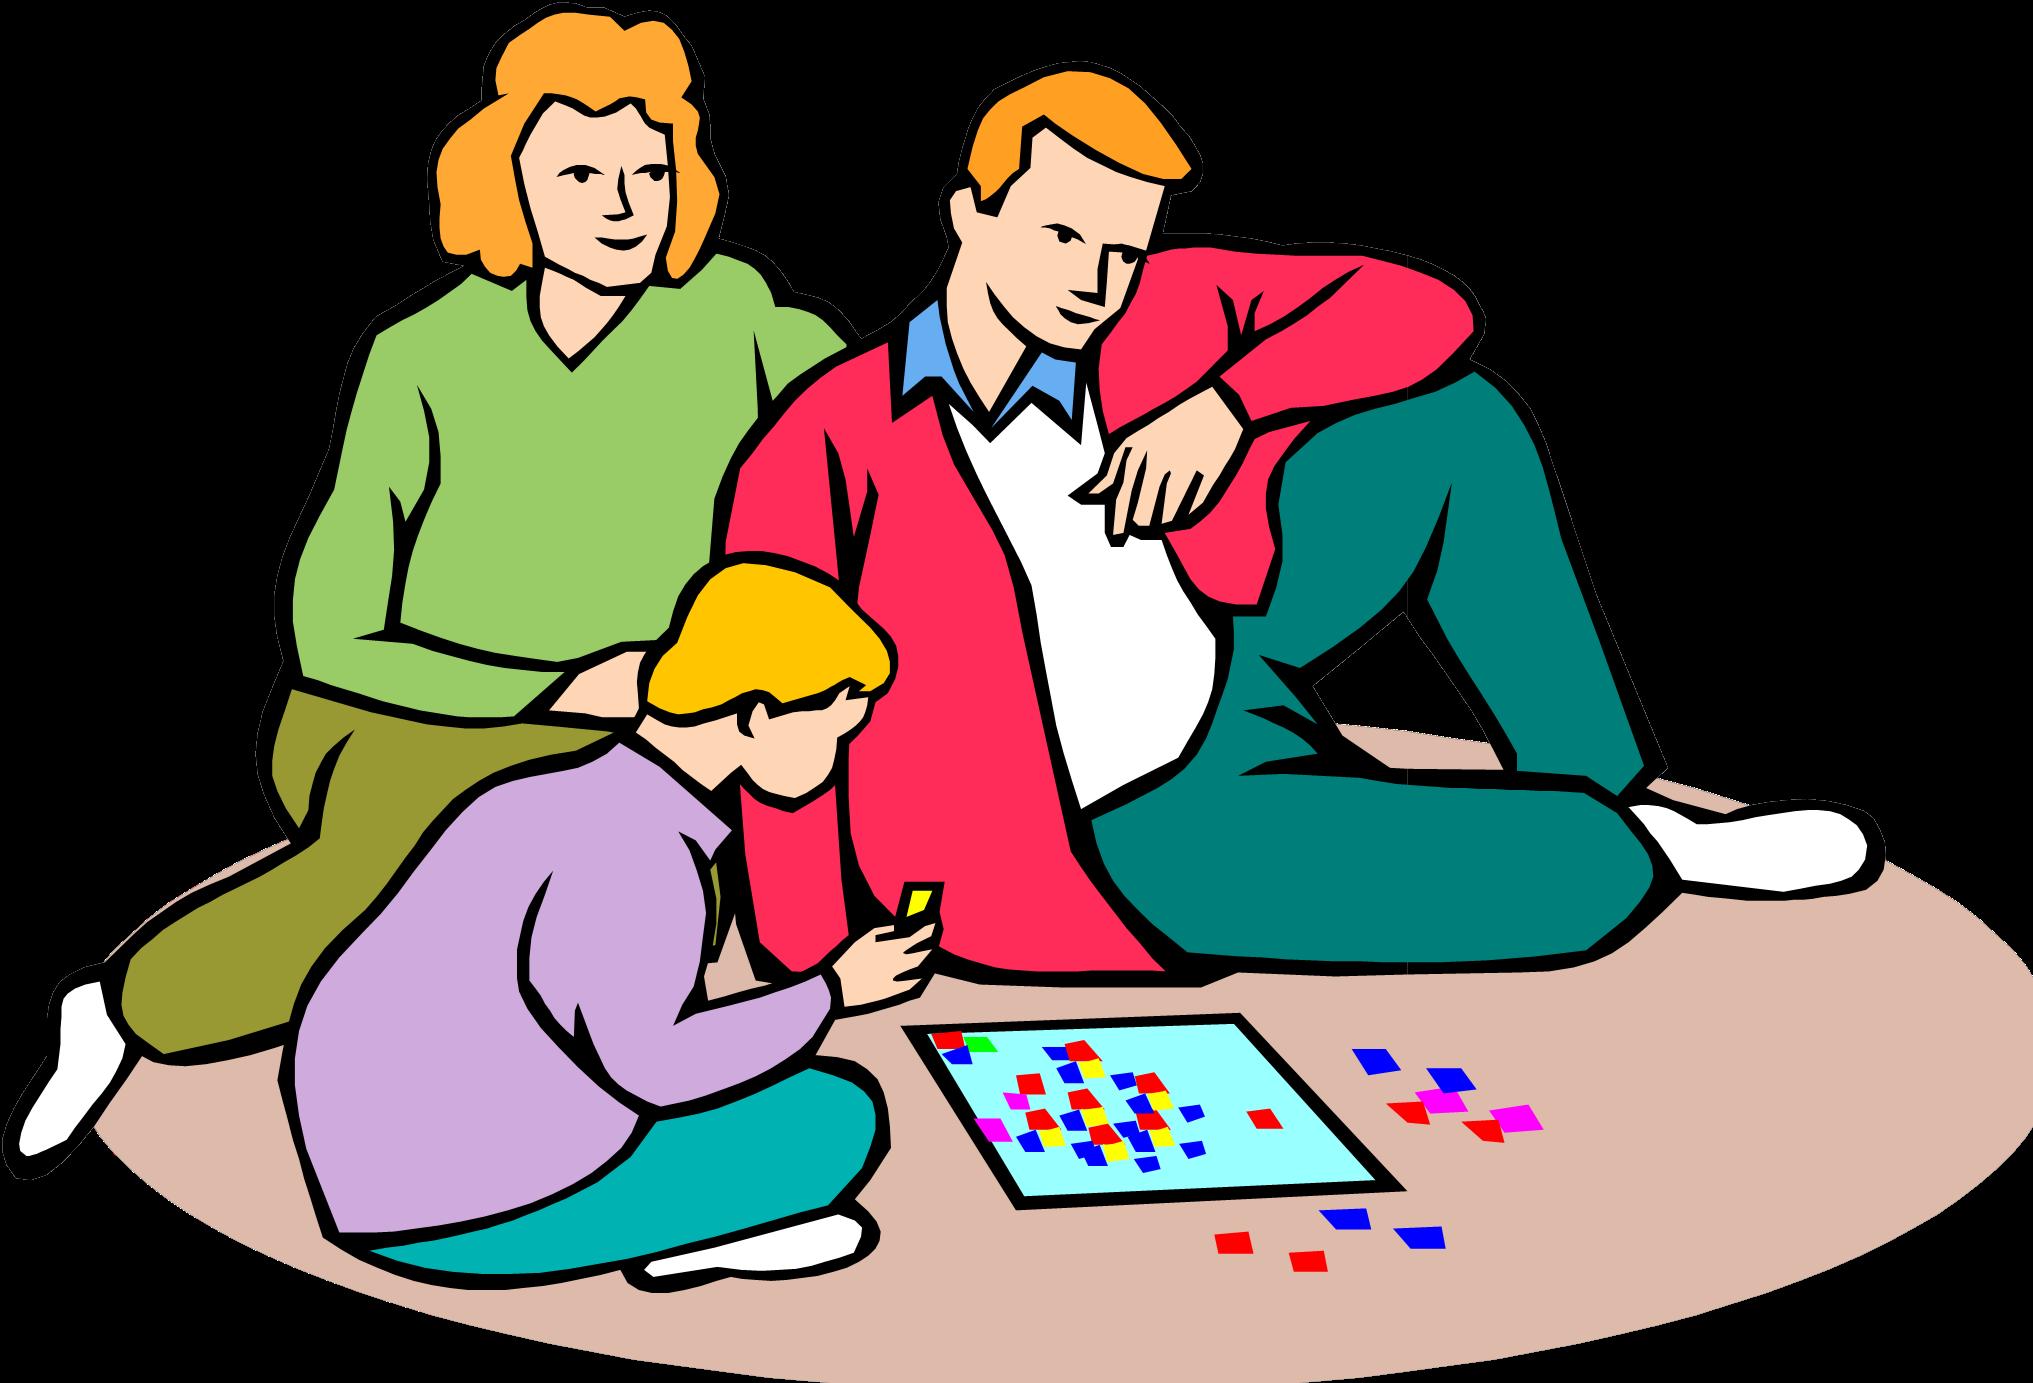 Family Time Isolation Flat Vector Illustration Board Games Cartoon  Illustration Stock Illustration - Download Image Now - iStock